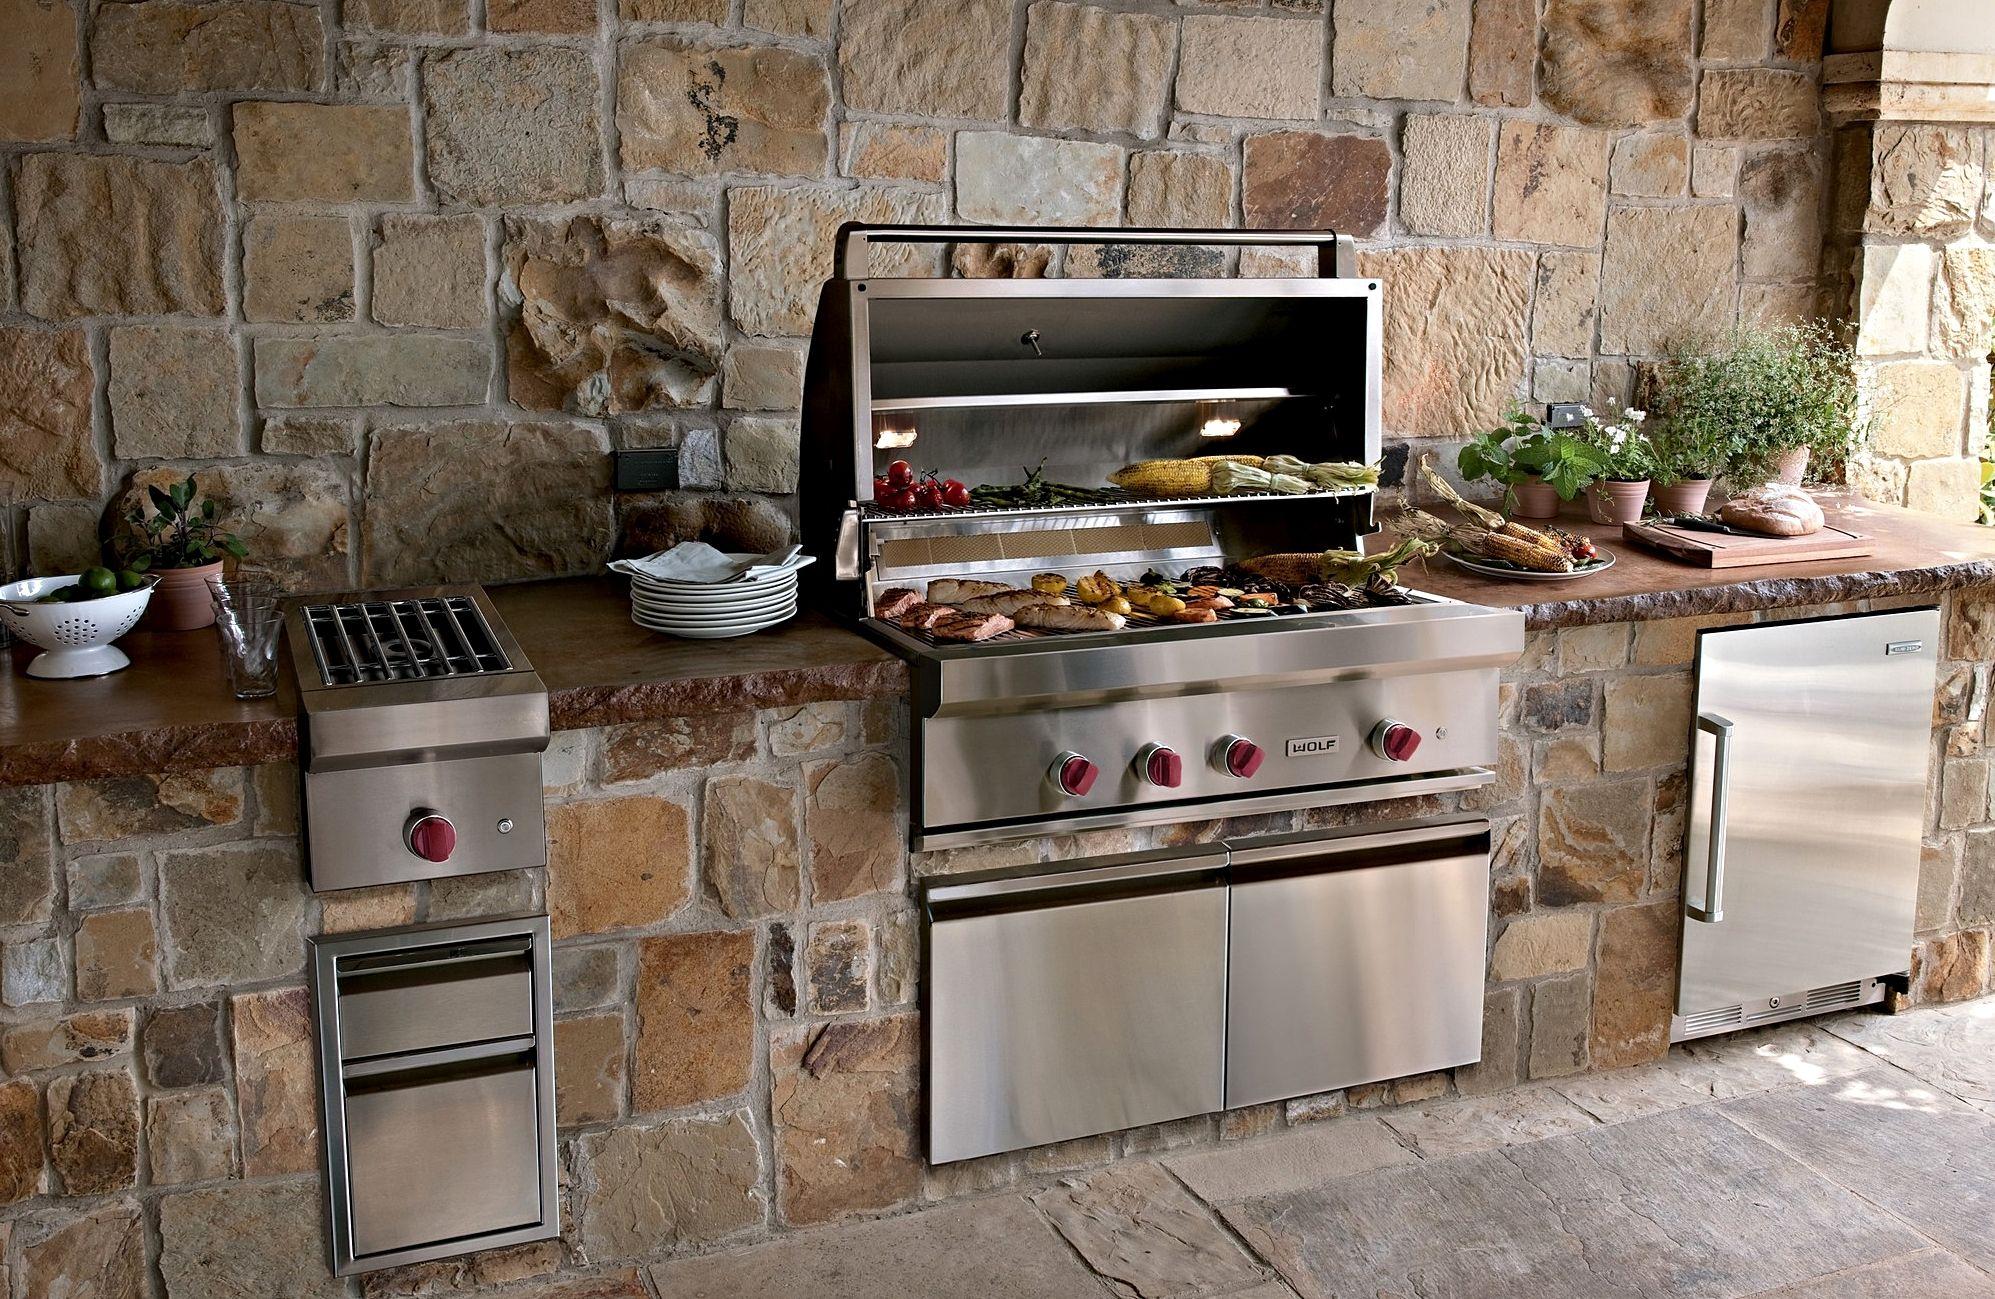 Outdoor Küchen Geräte : Top outdoor küchengeräte trends bathroom